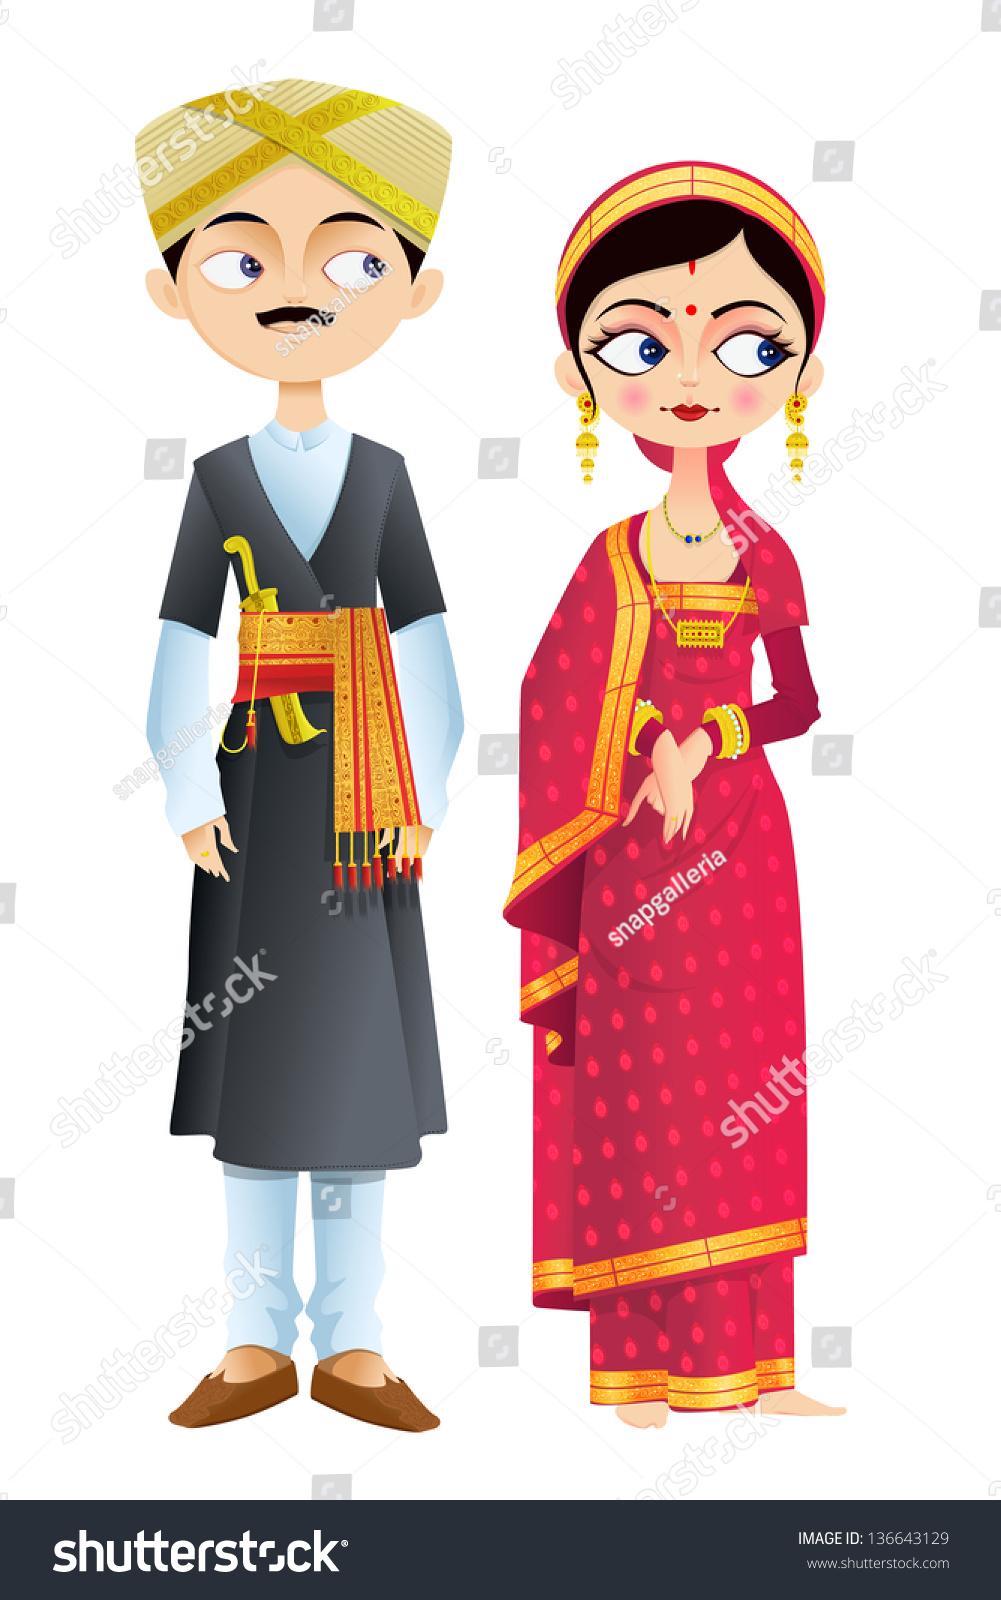 Easy Edit Vector Illustration Wedding Couple Stock Vector